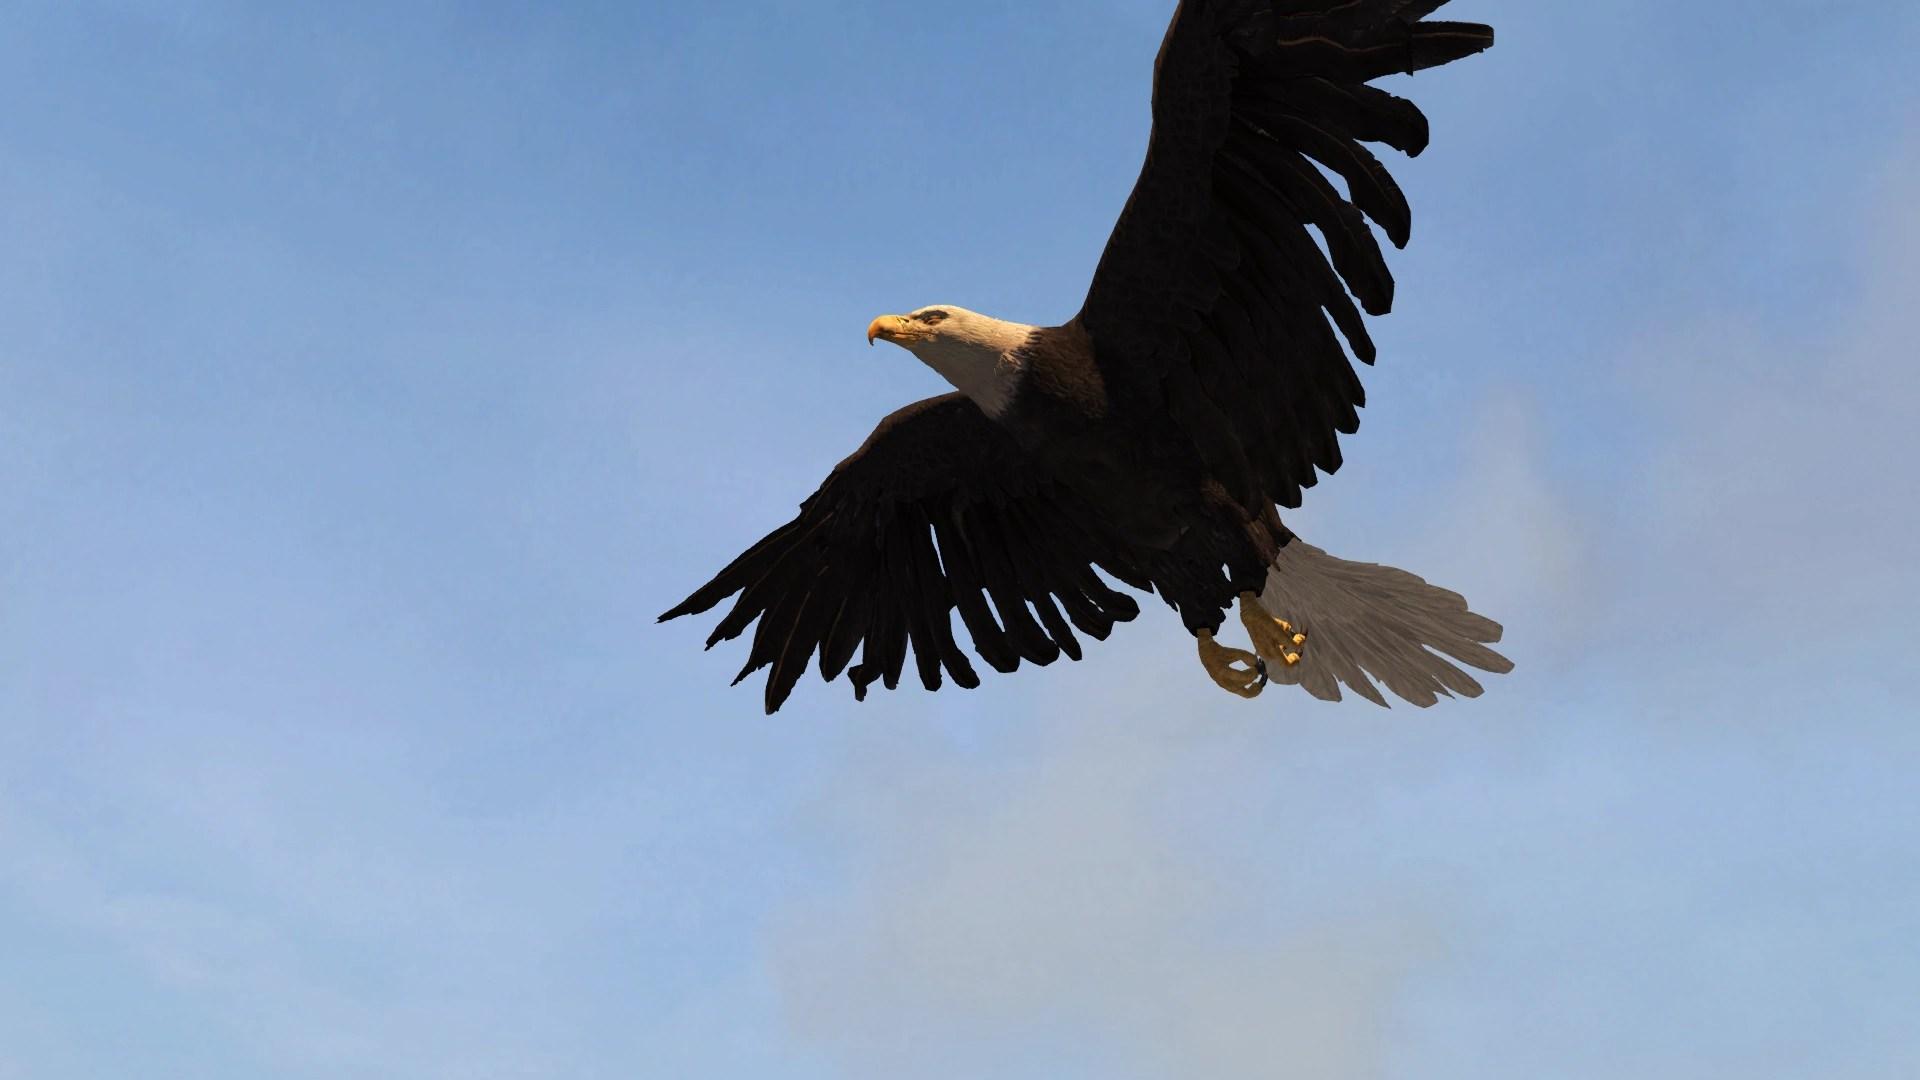 Fall Bird Wallpaper Eagles Assassin S Creed Wiki Fandom Powered By Wikia